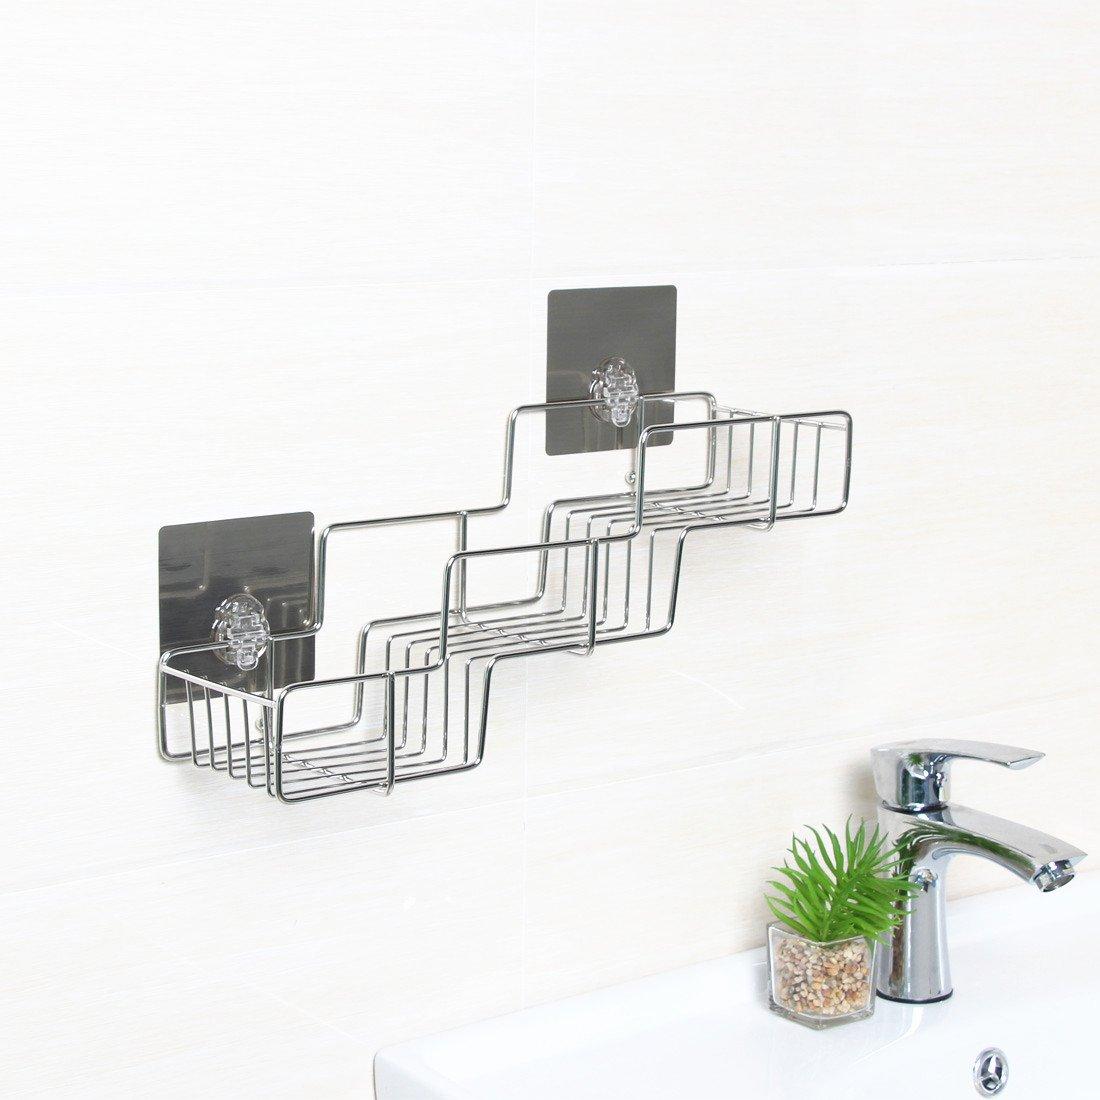 stainless steel bathroom shelves. Stainless Steel Shelf Organizer, Rerii Self Adhesive Bathroom Shower Rack Organizer For Shampoo, Kitchen Condiment Shelves E